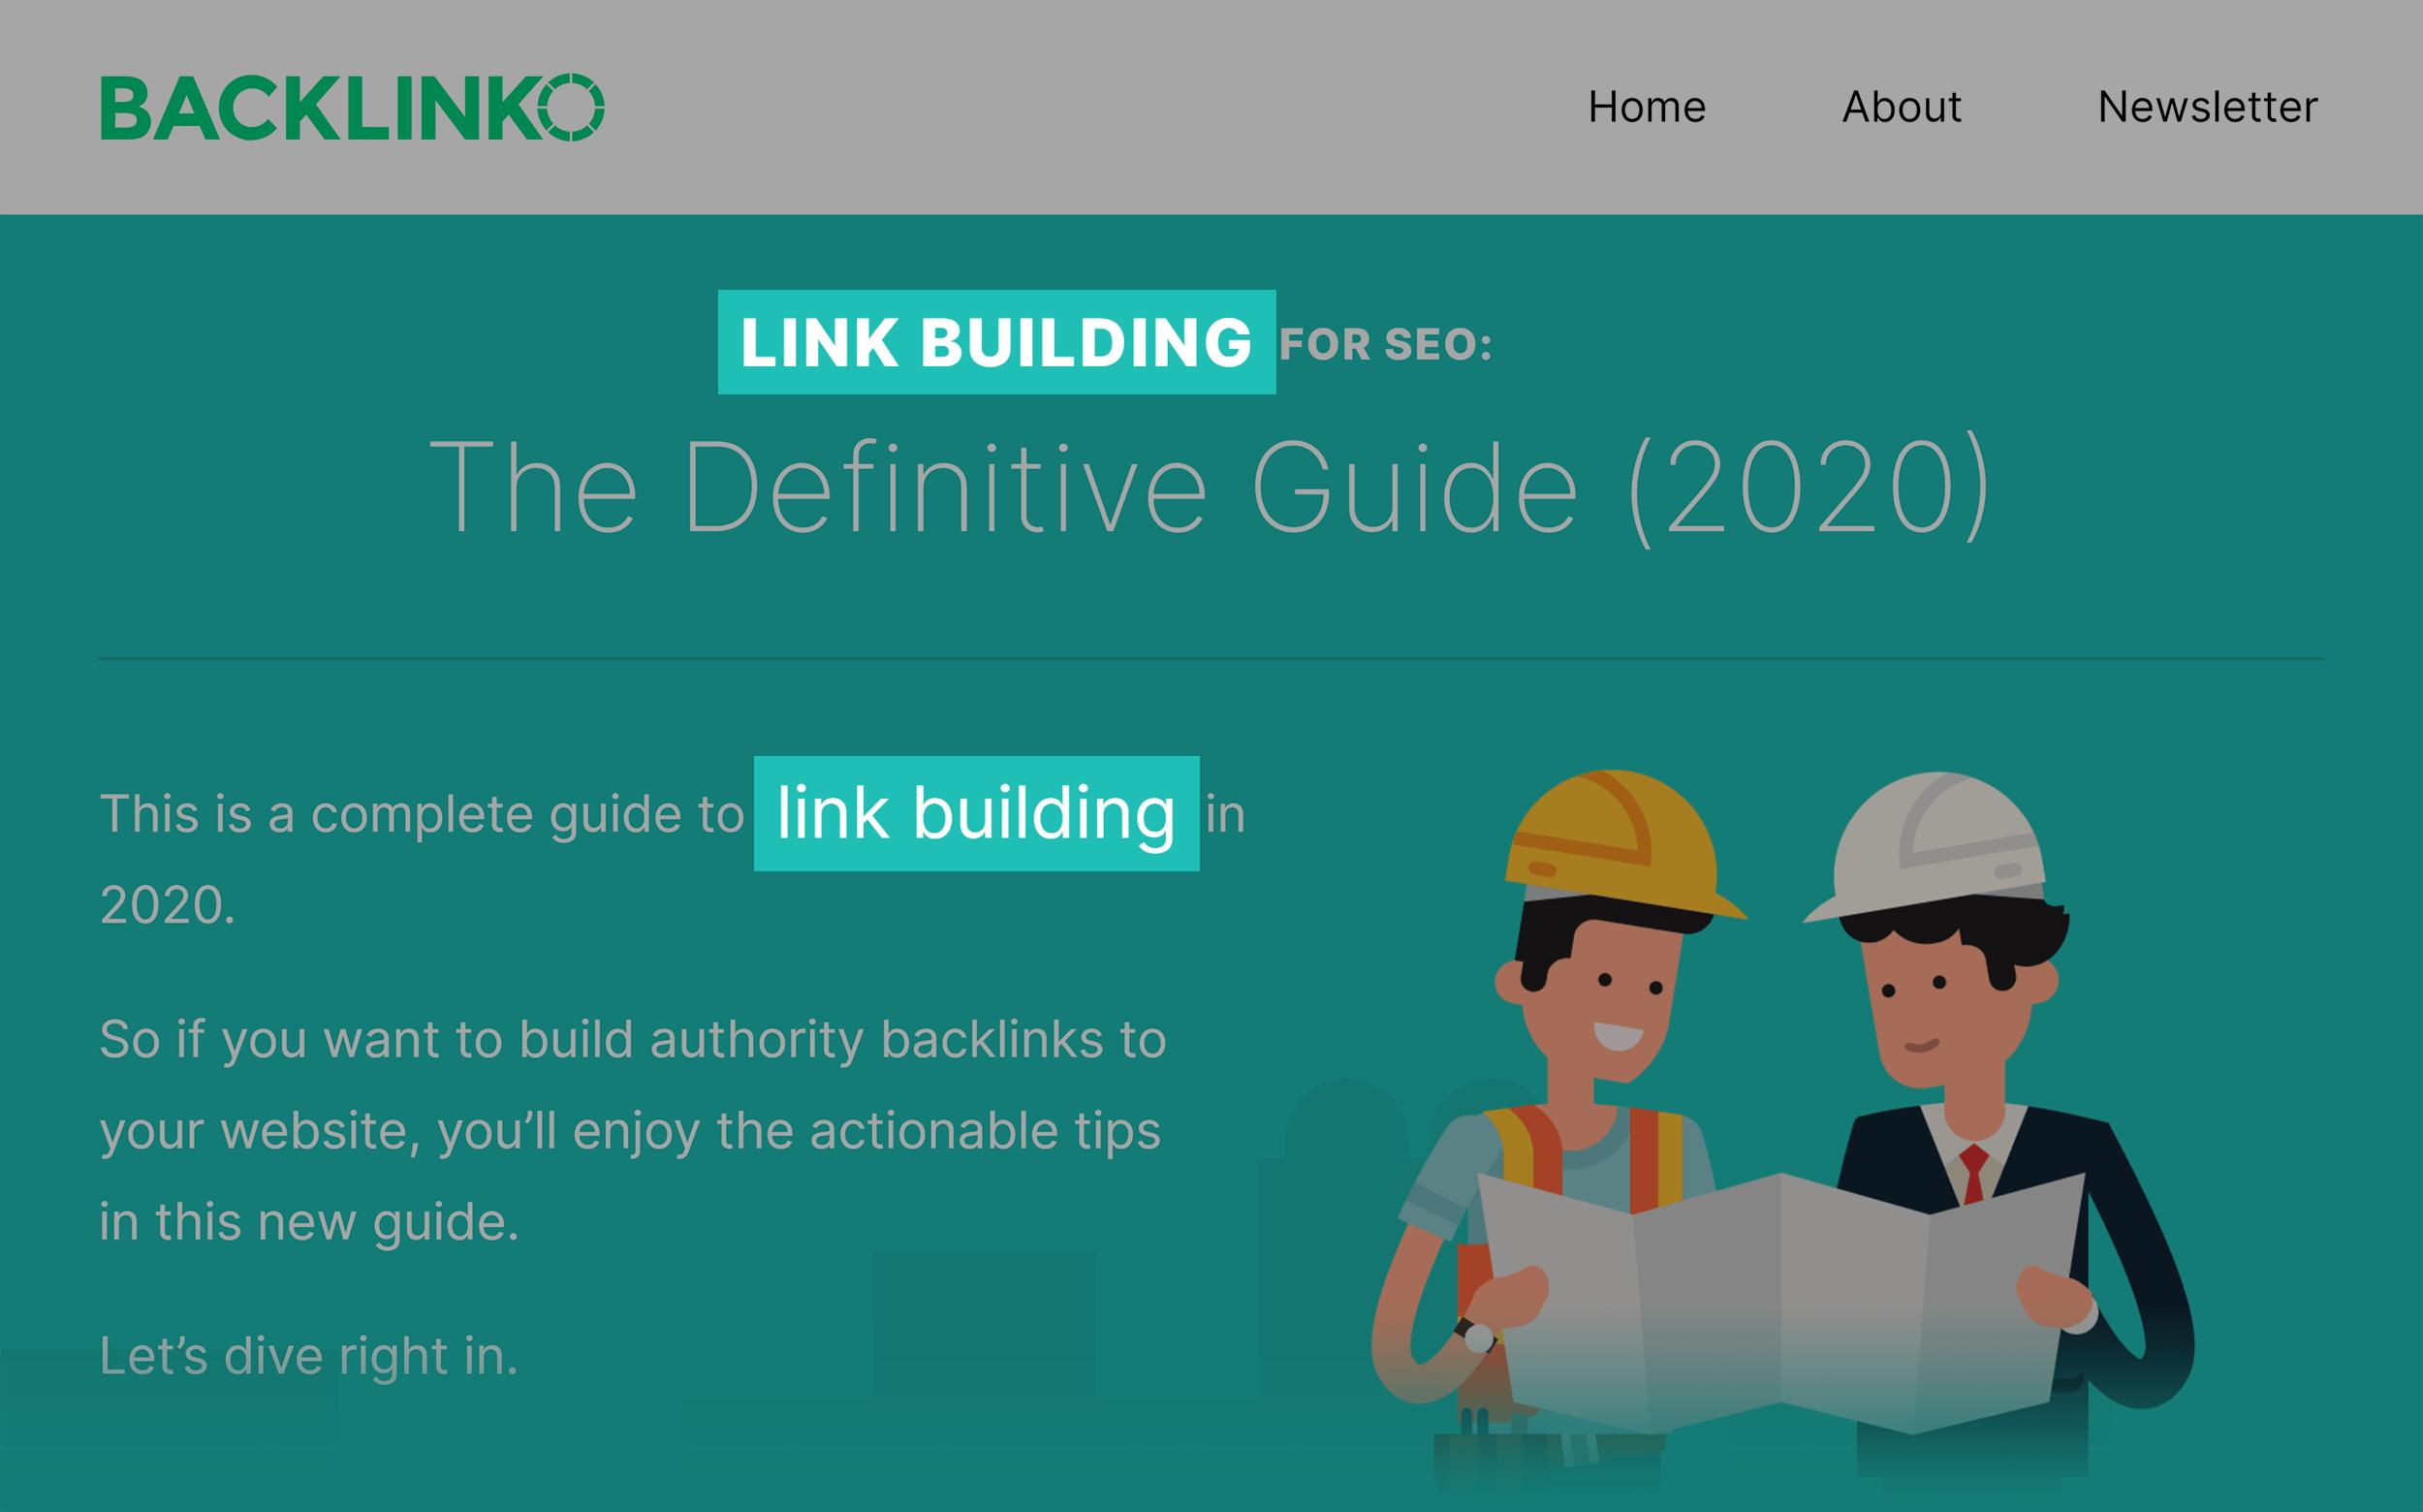 Backlinko Link Building Guide Keywords